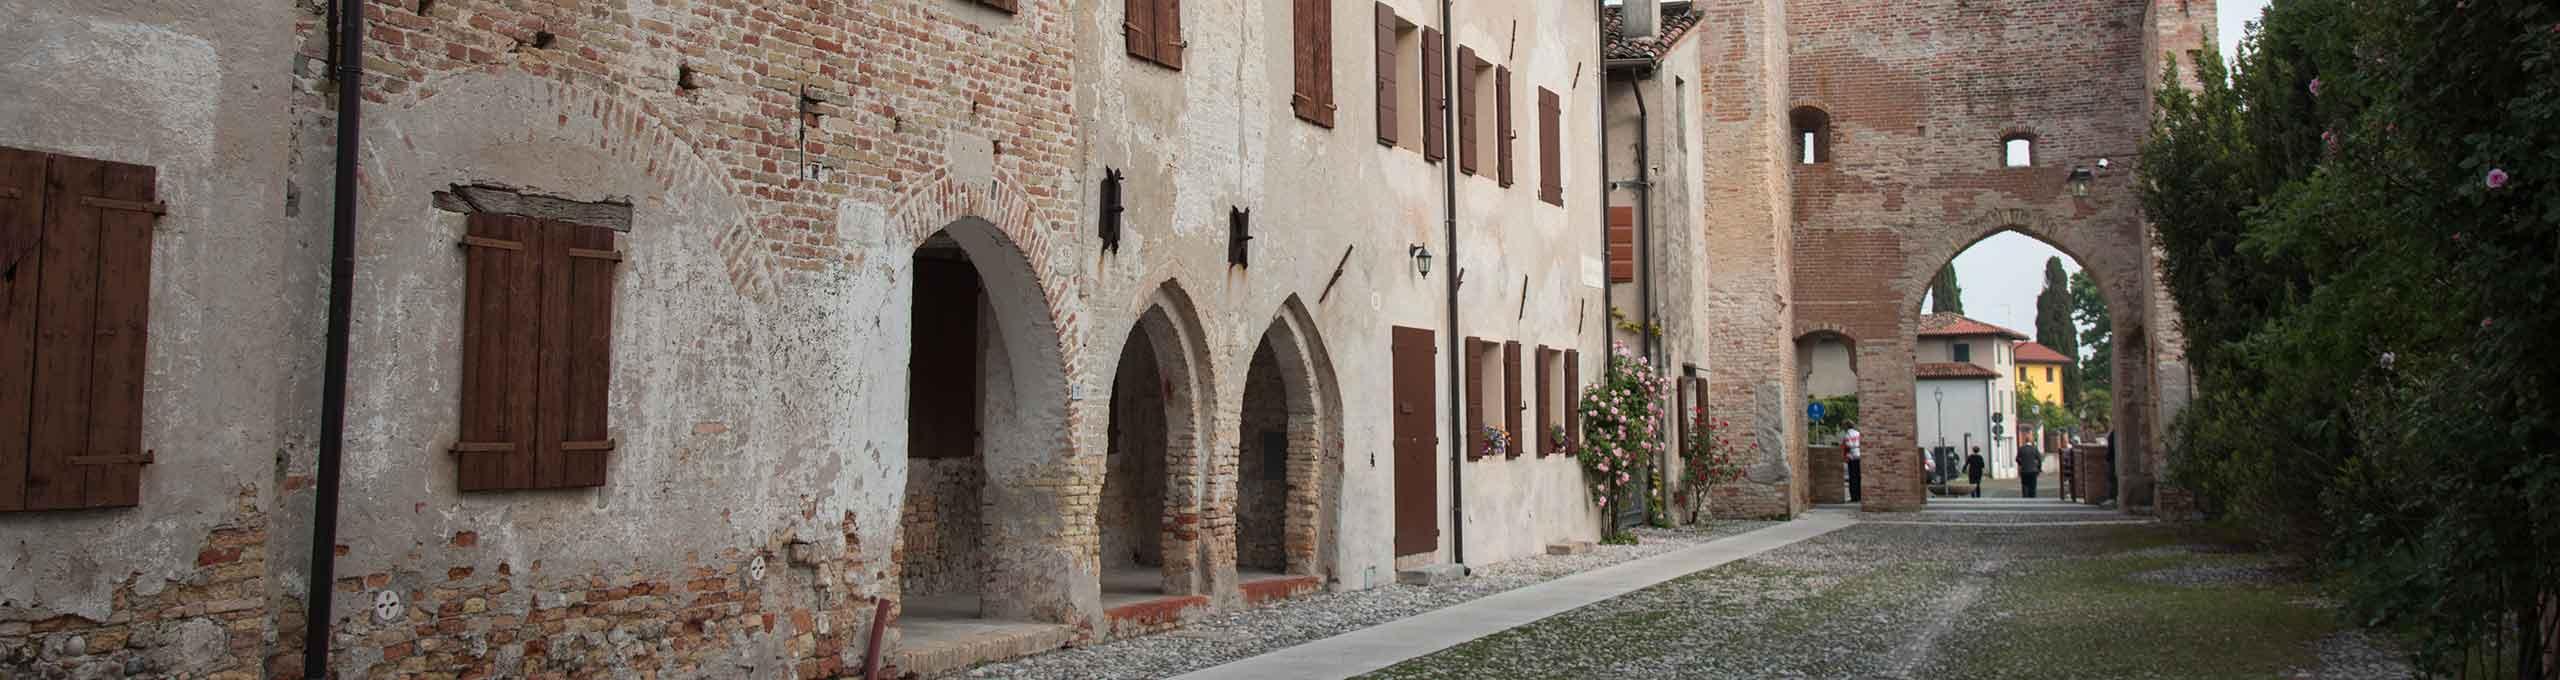 Cordovado, Udine e dintorni